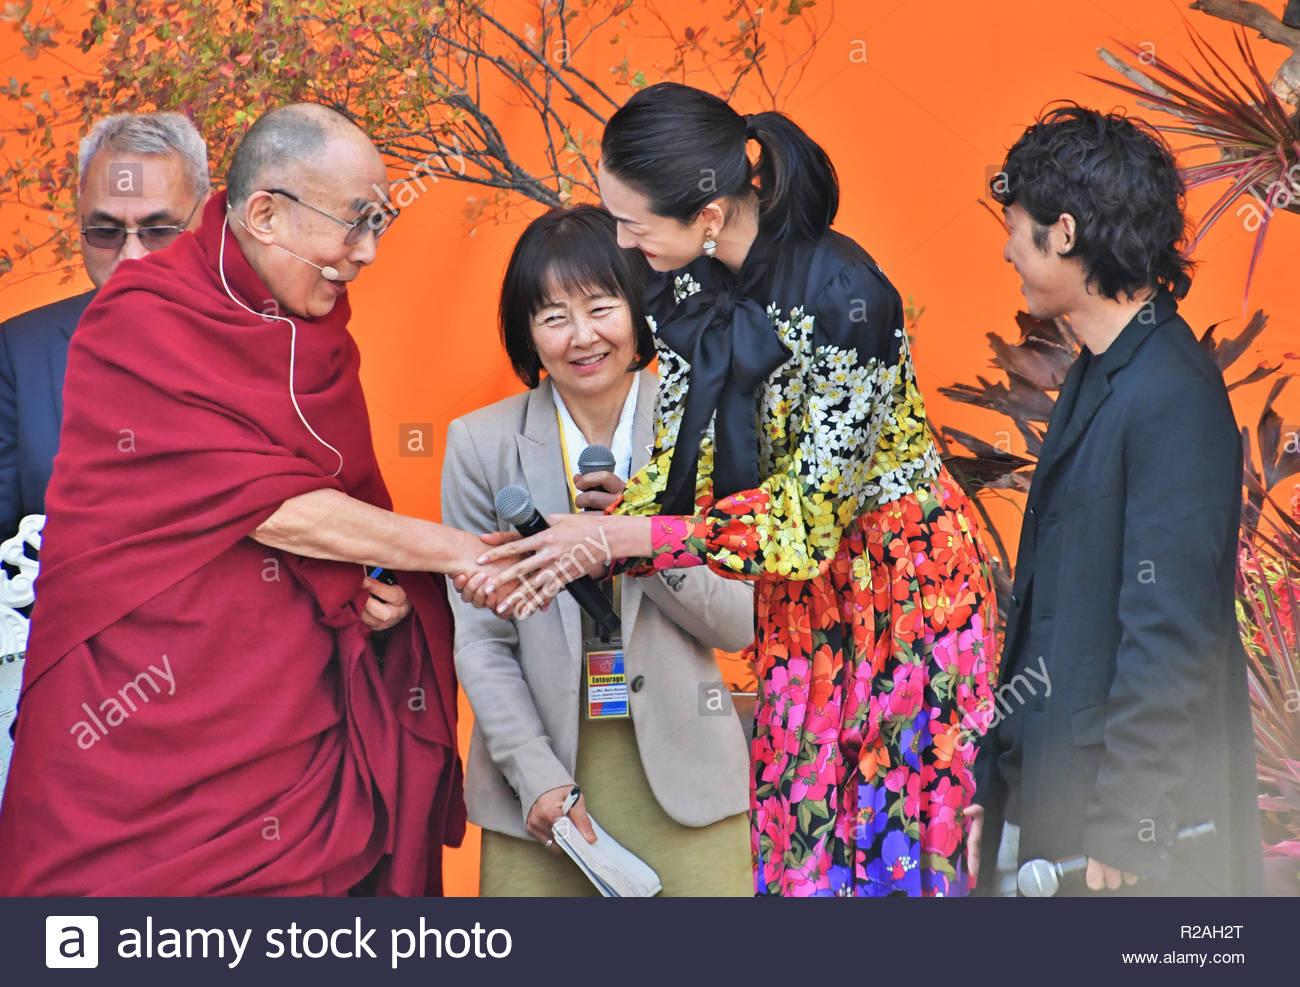 Tokyo, Japan  17th Nov, 2018  (L-R) The 14th Dalai Lama